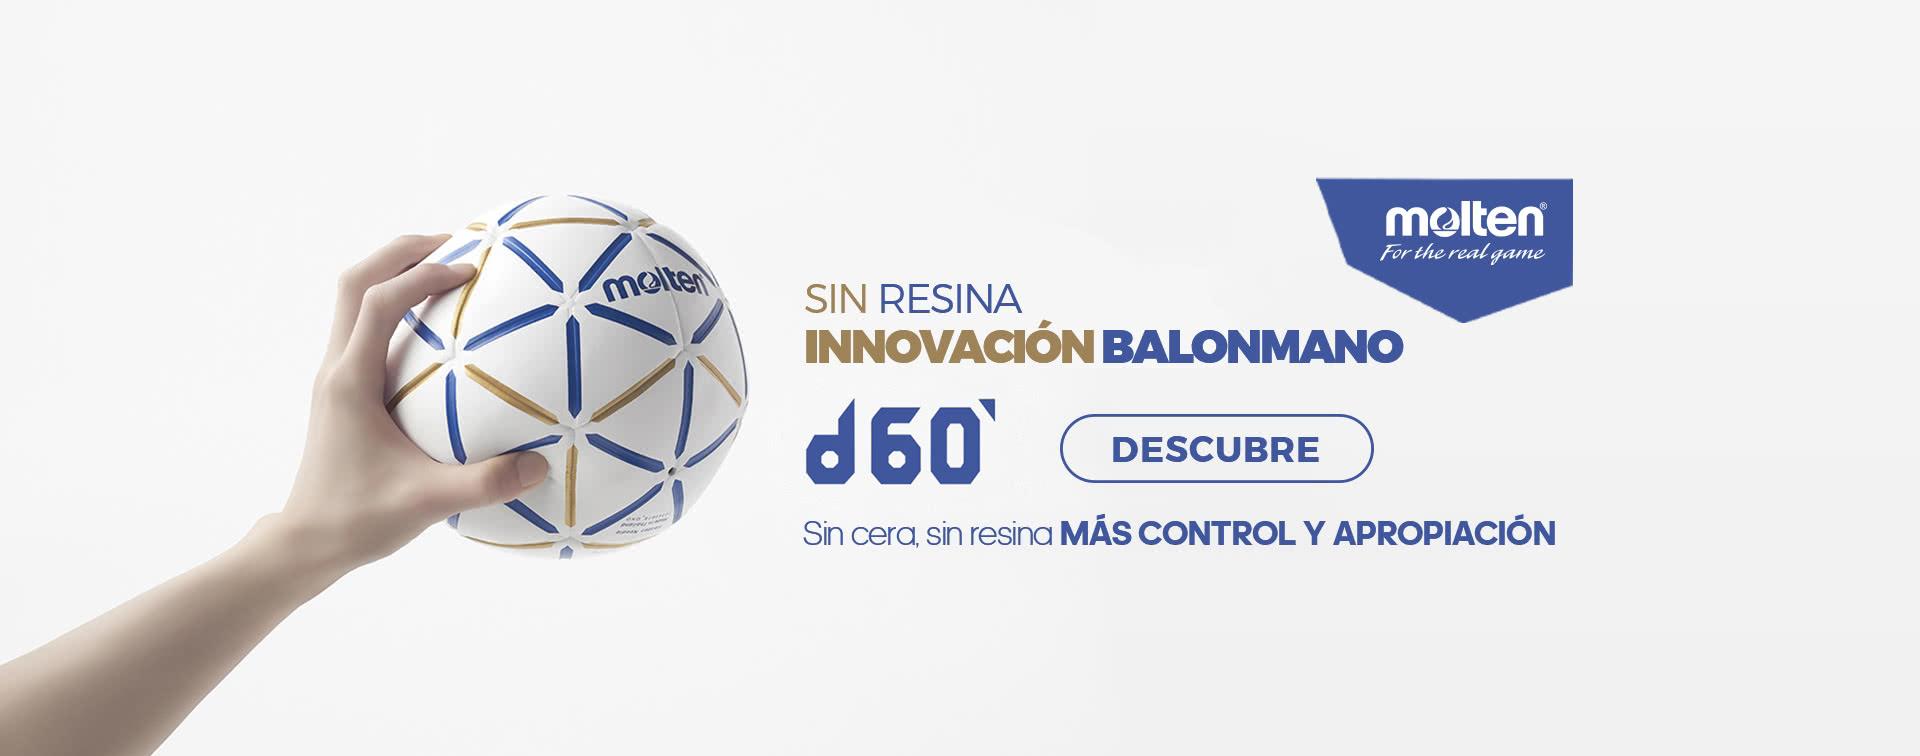 Molten nuevo balon d60